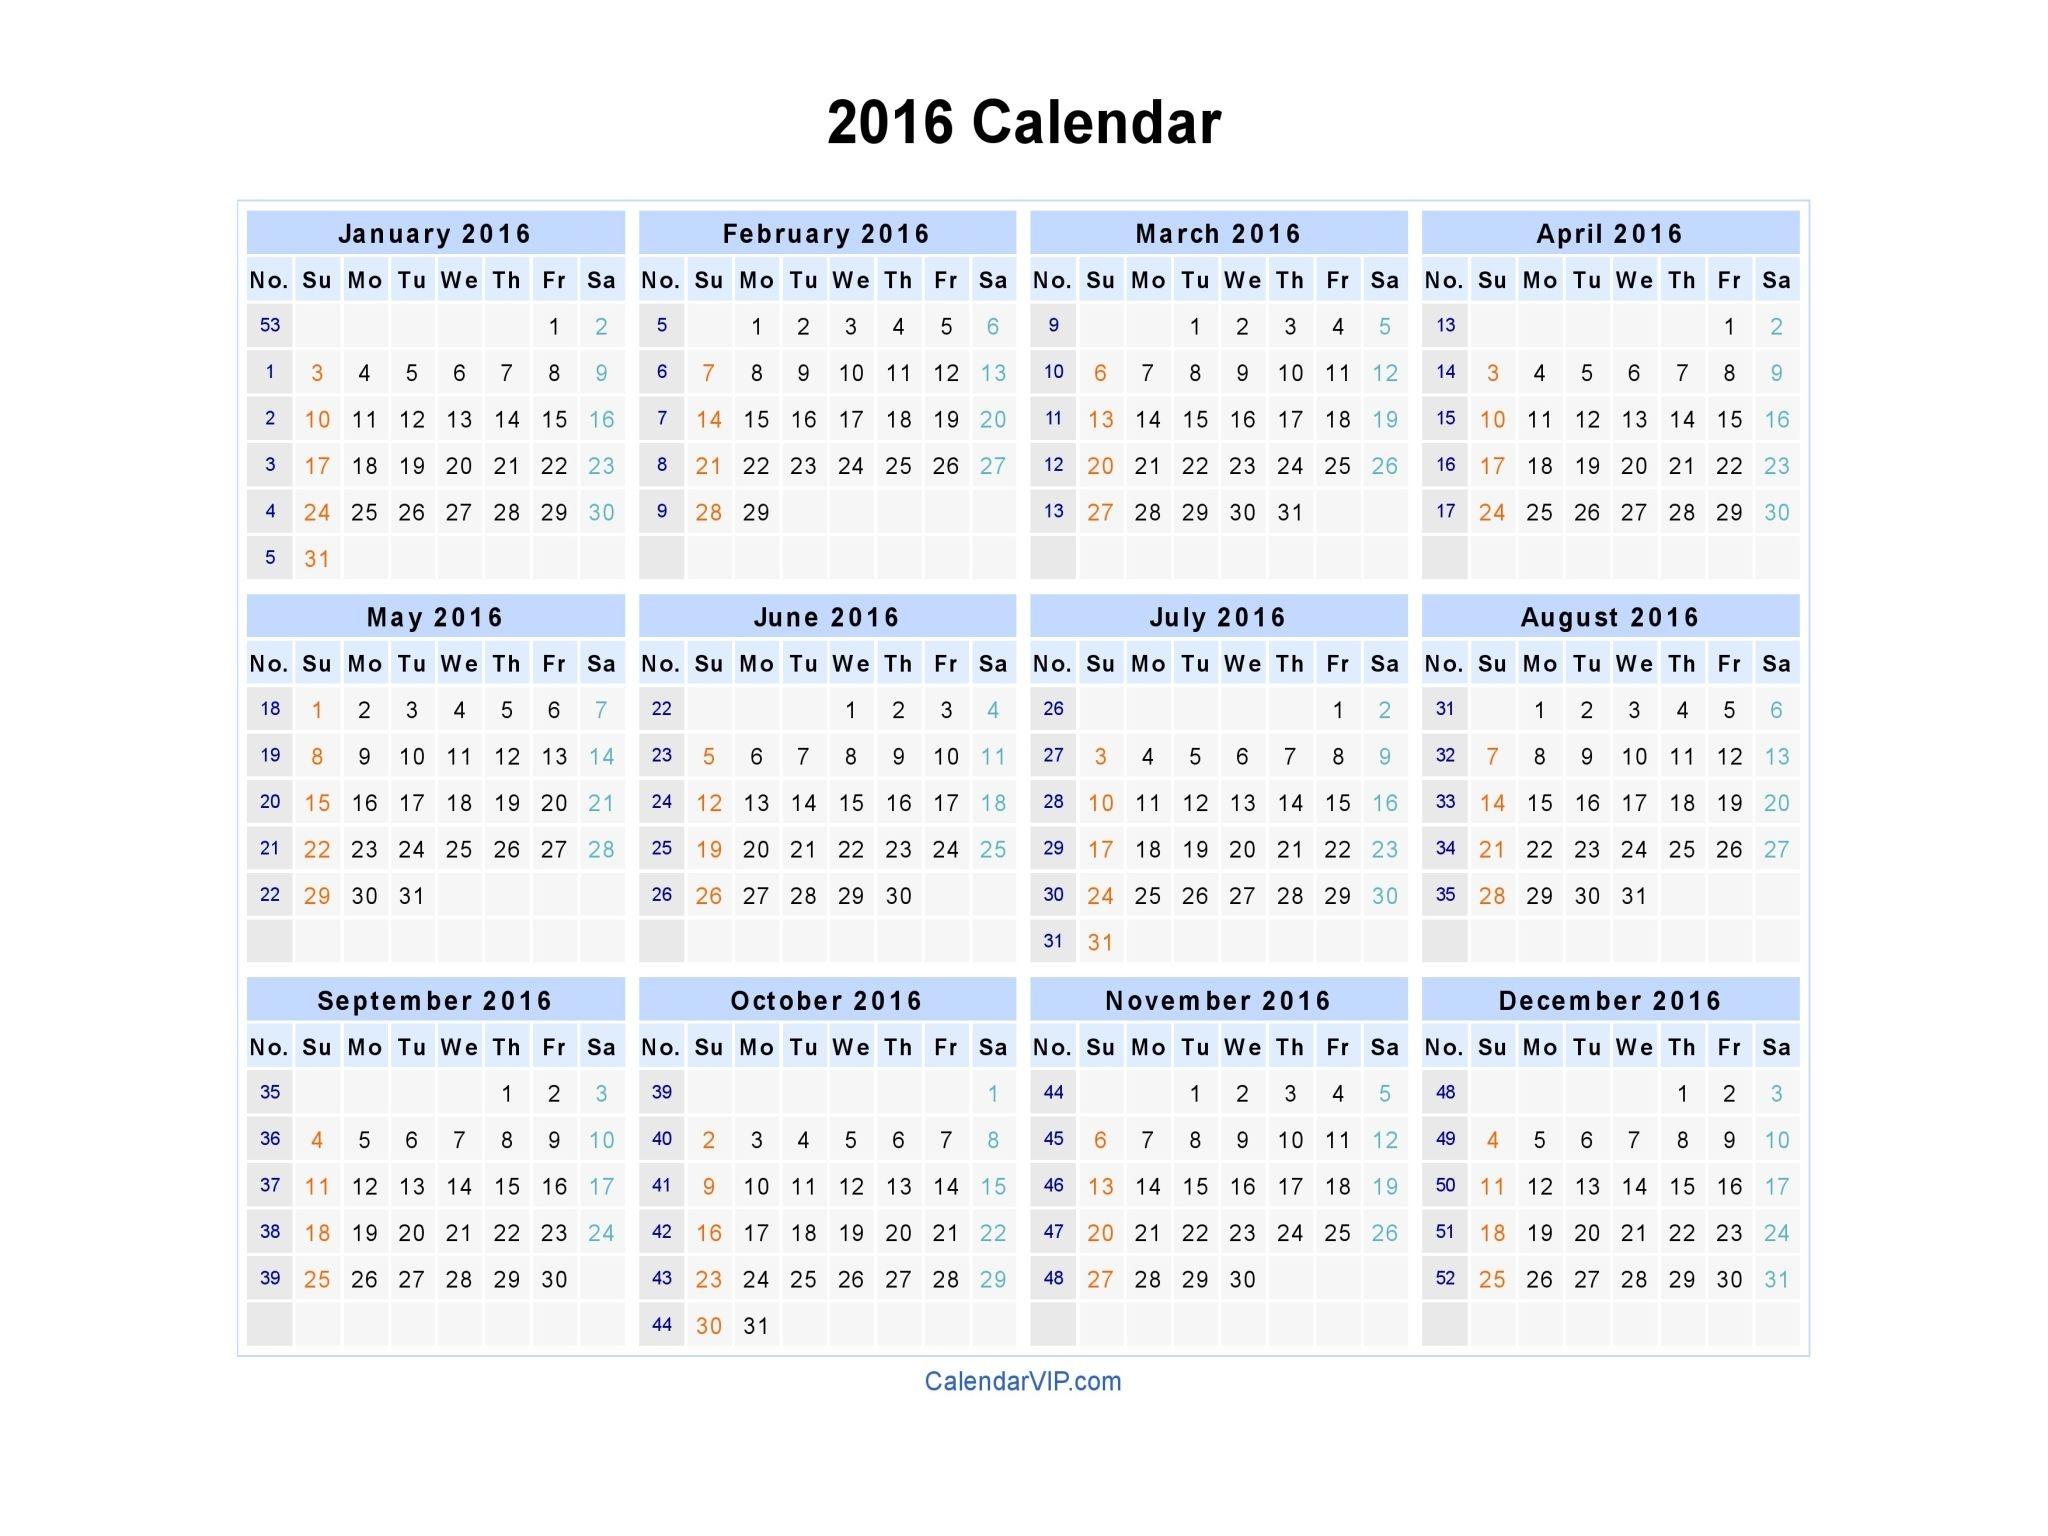 2016 Calendar - Blank Printable Calendar Template In Pdf